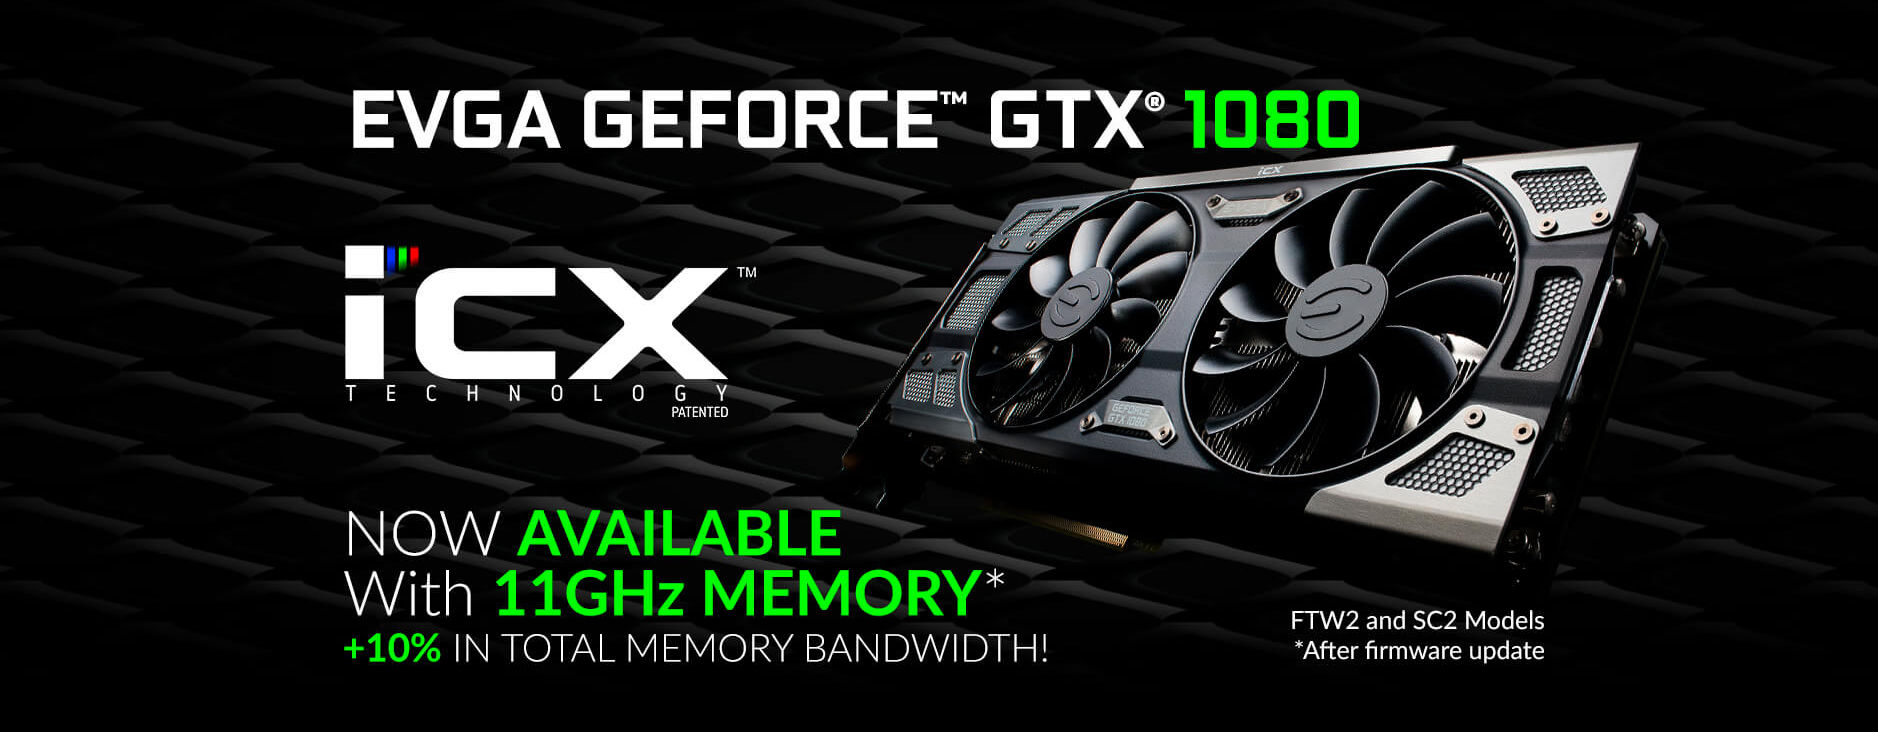 EVGA announces GTX 1080 11Gbps and GTX 1060 9Gbps